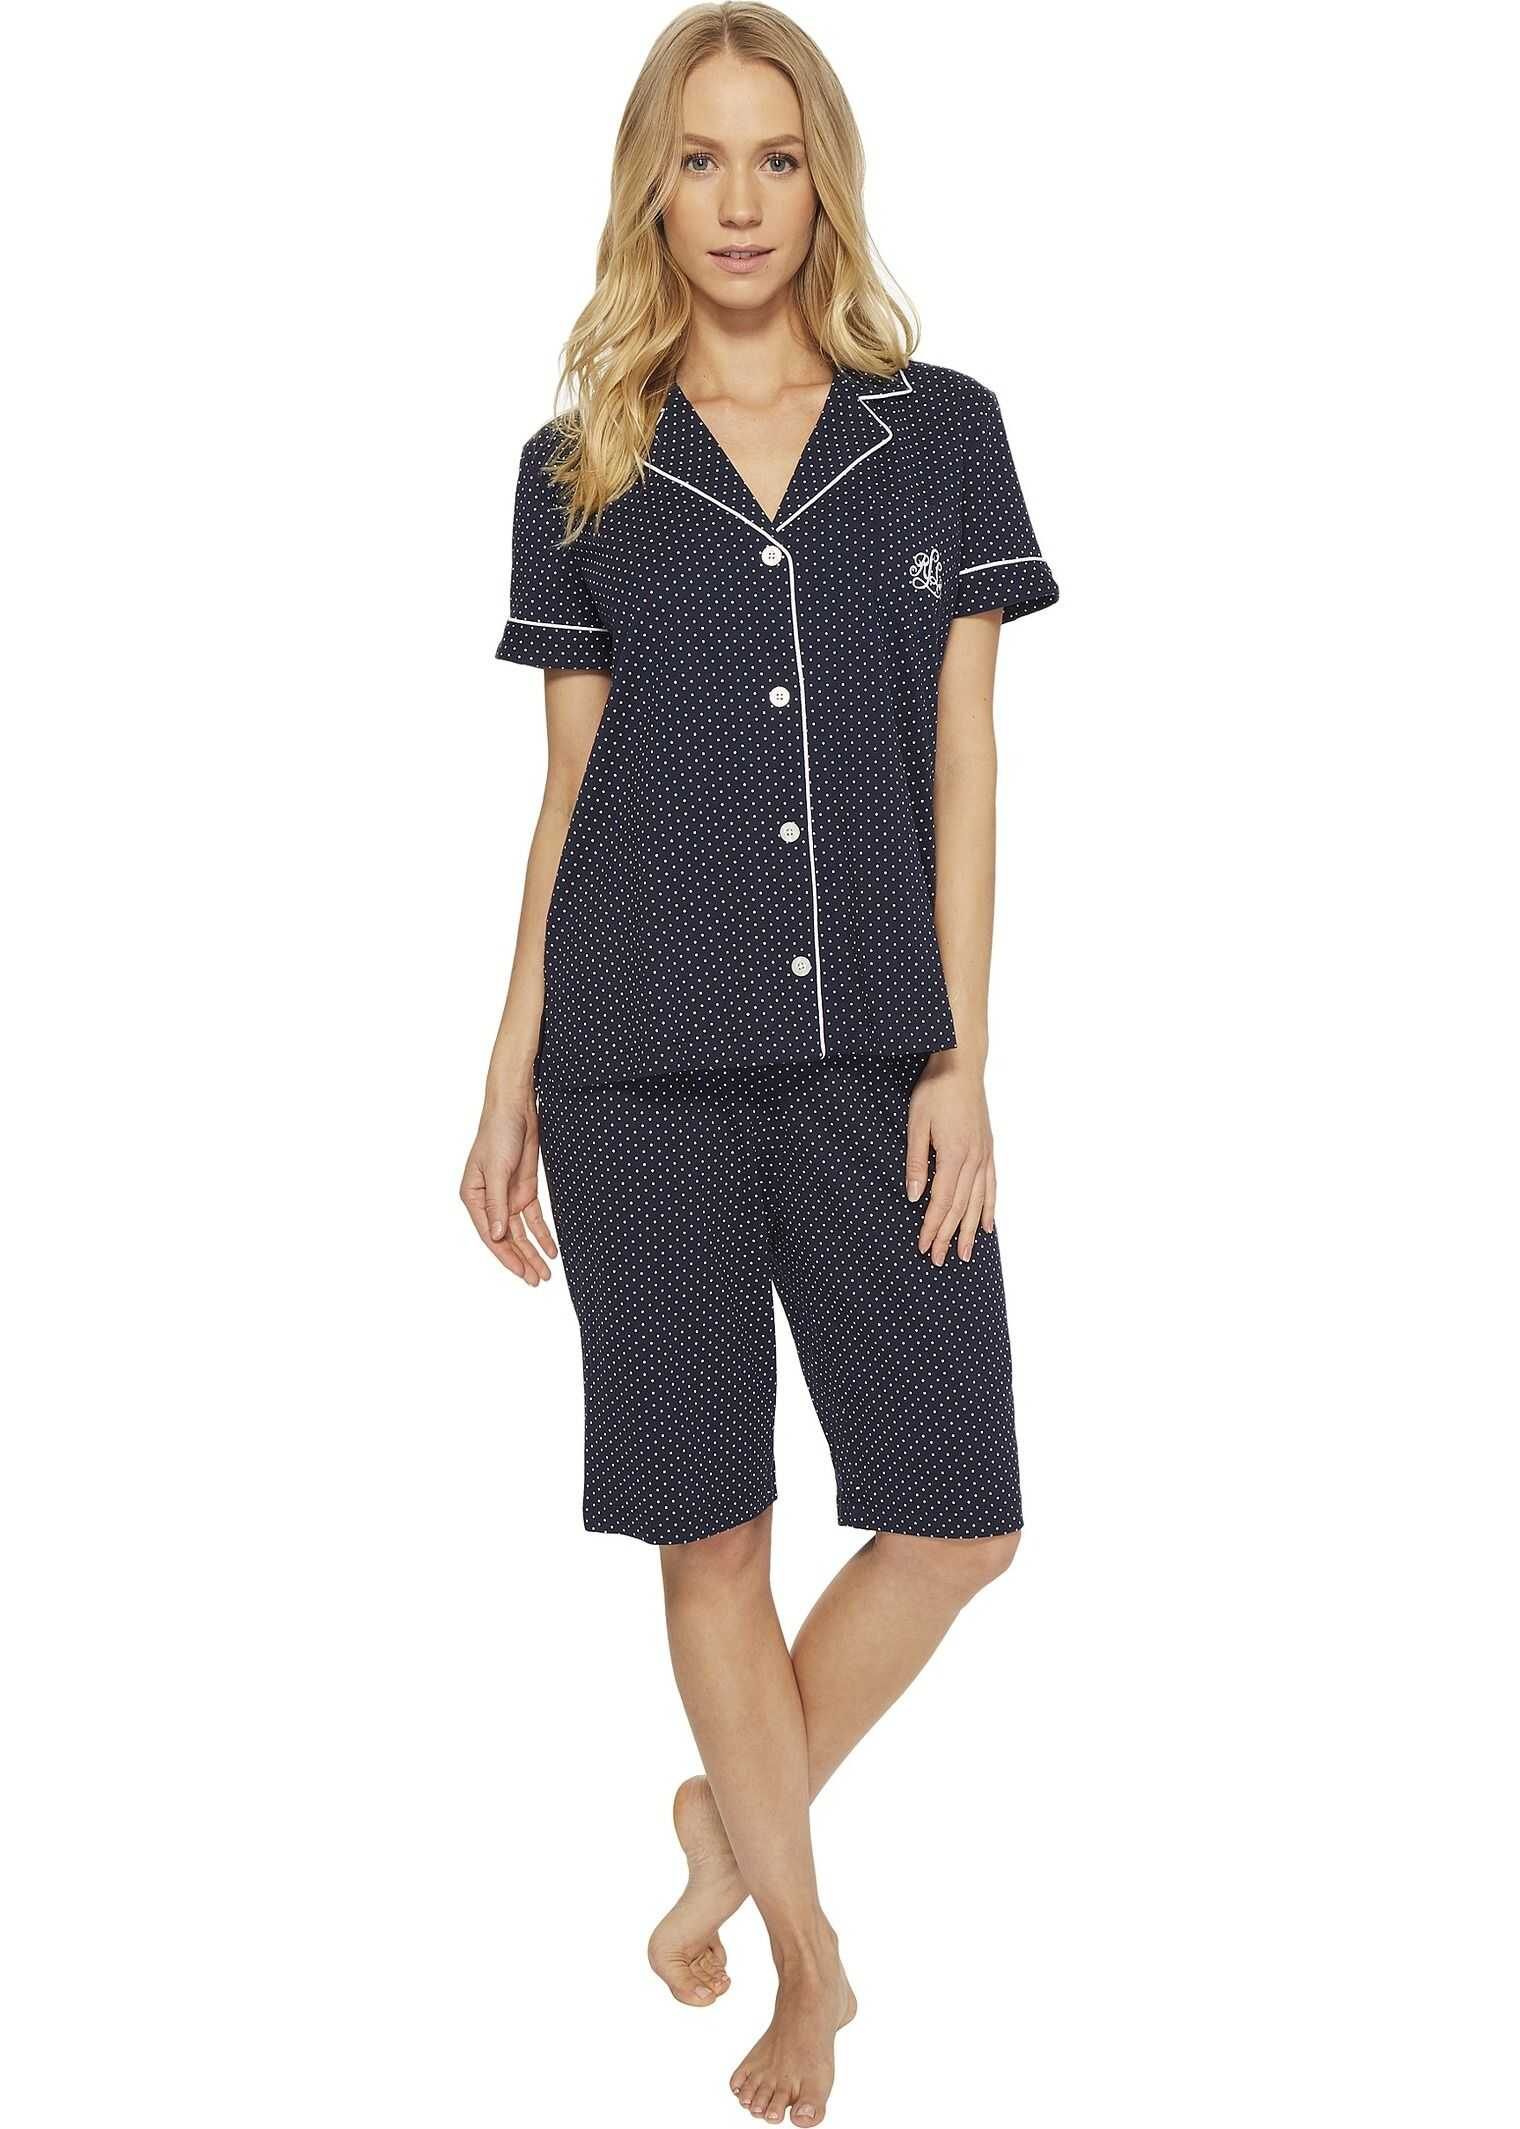 Ralph Lauren Short Sleeve Notch Collar Bermuda PJ Set Windsor Navy/White Dot